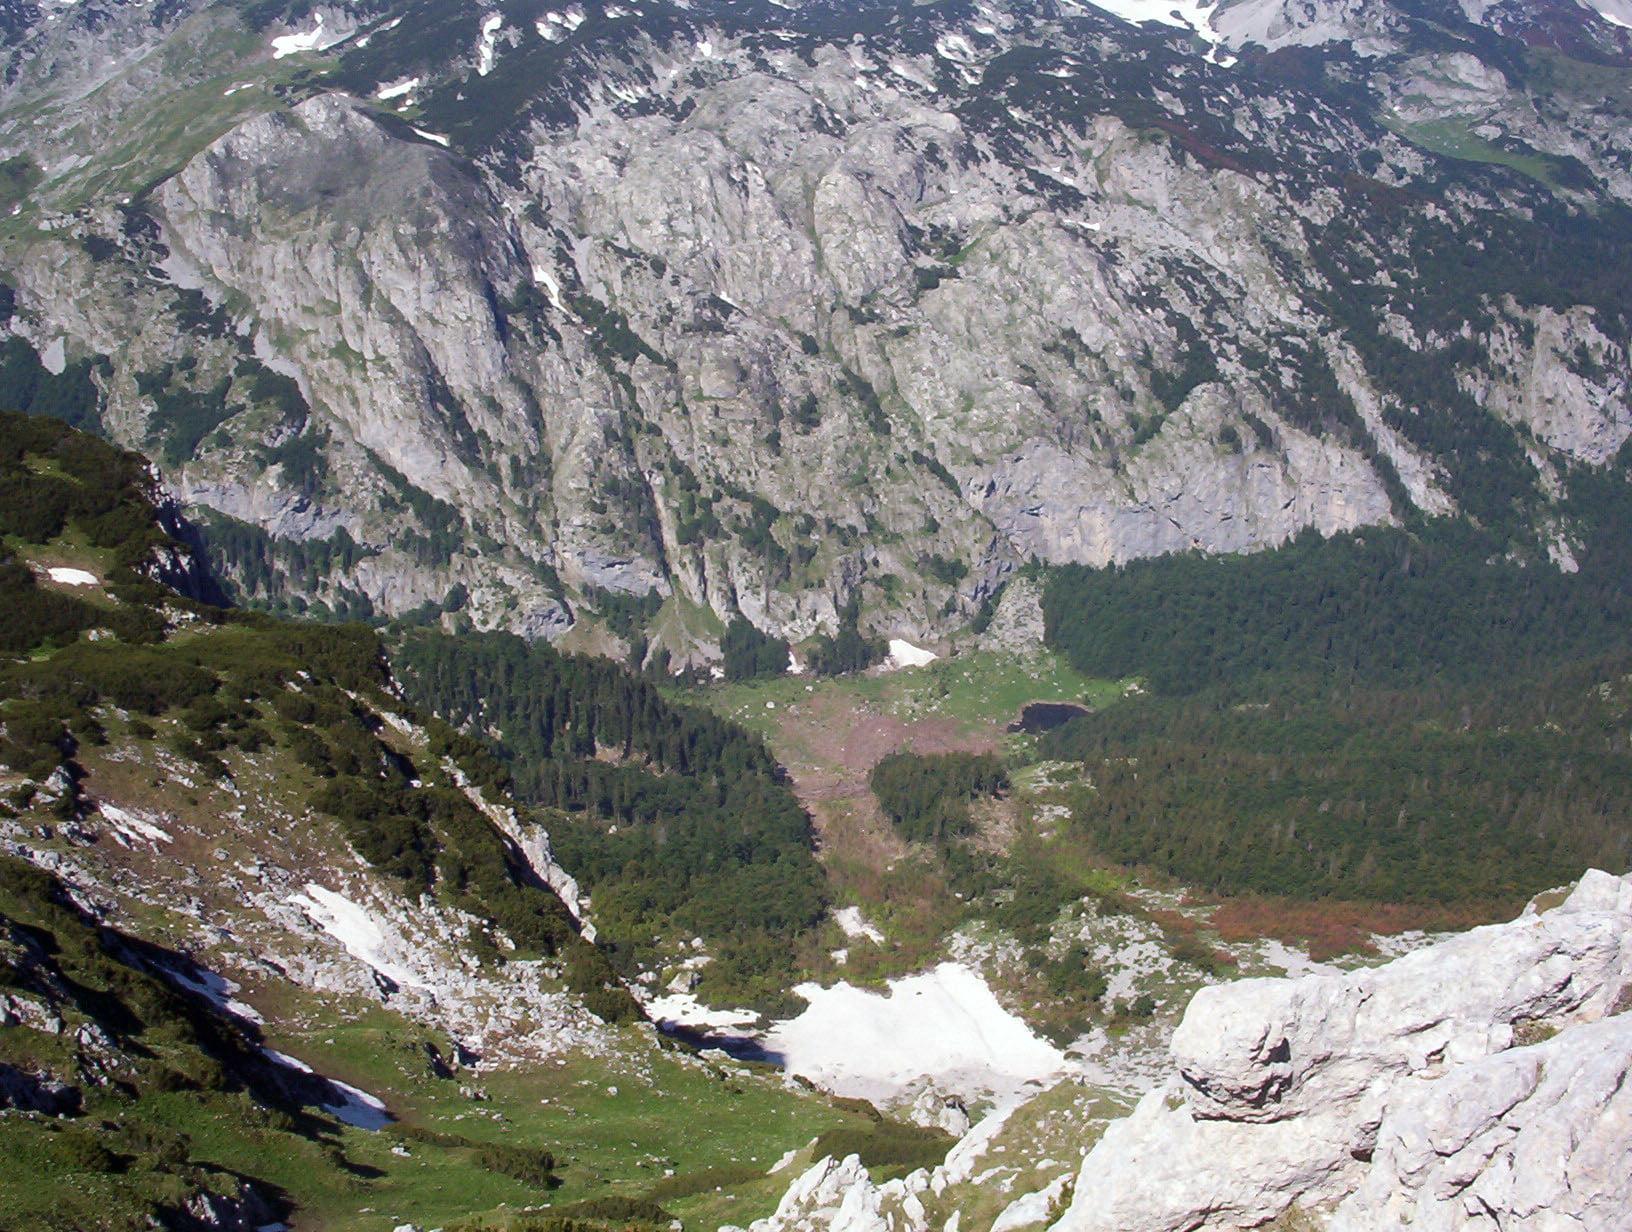 Bosna_i_Hercegovina_Republika_Srpska_Putovanje_Planinarenje_Akcija_povoljno_Maglic